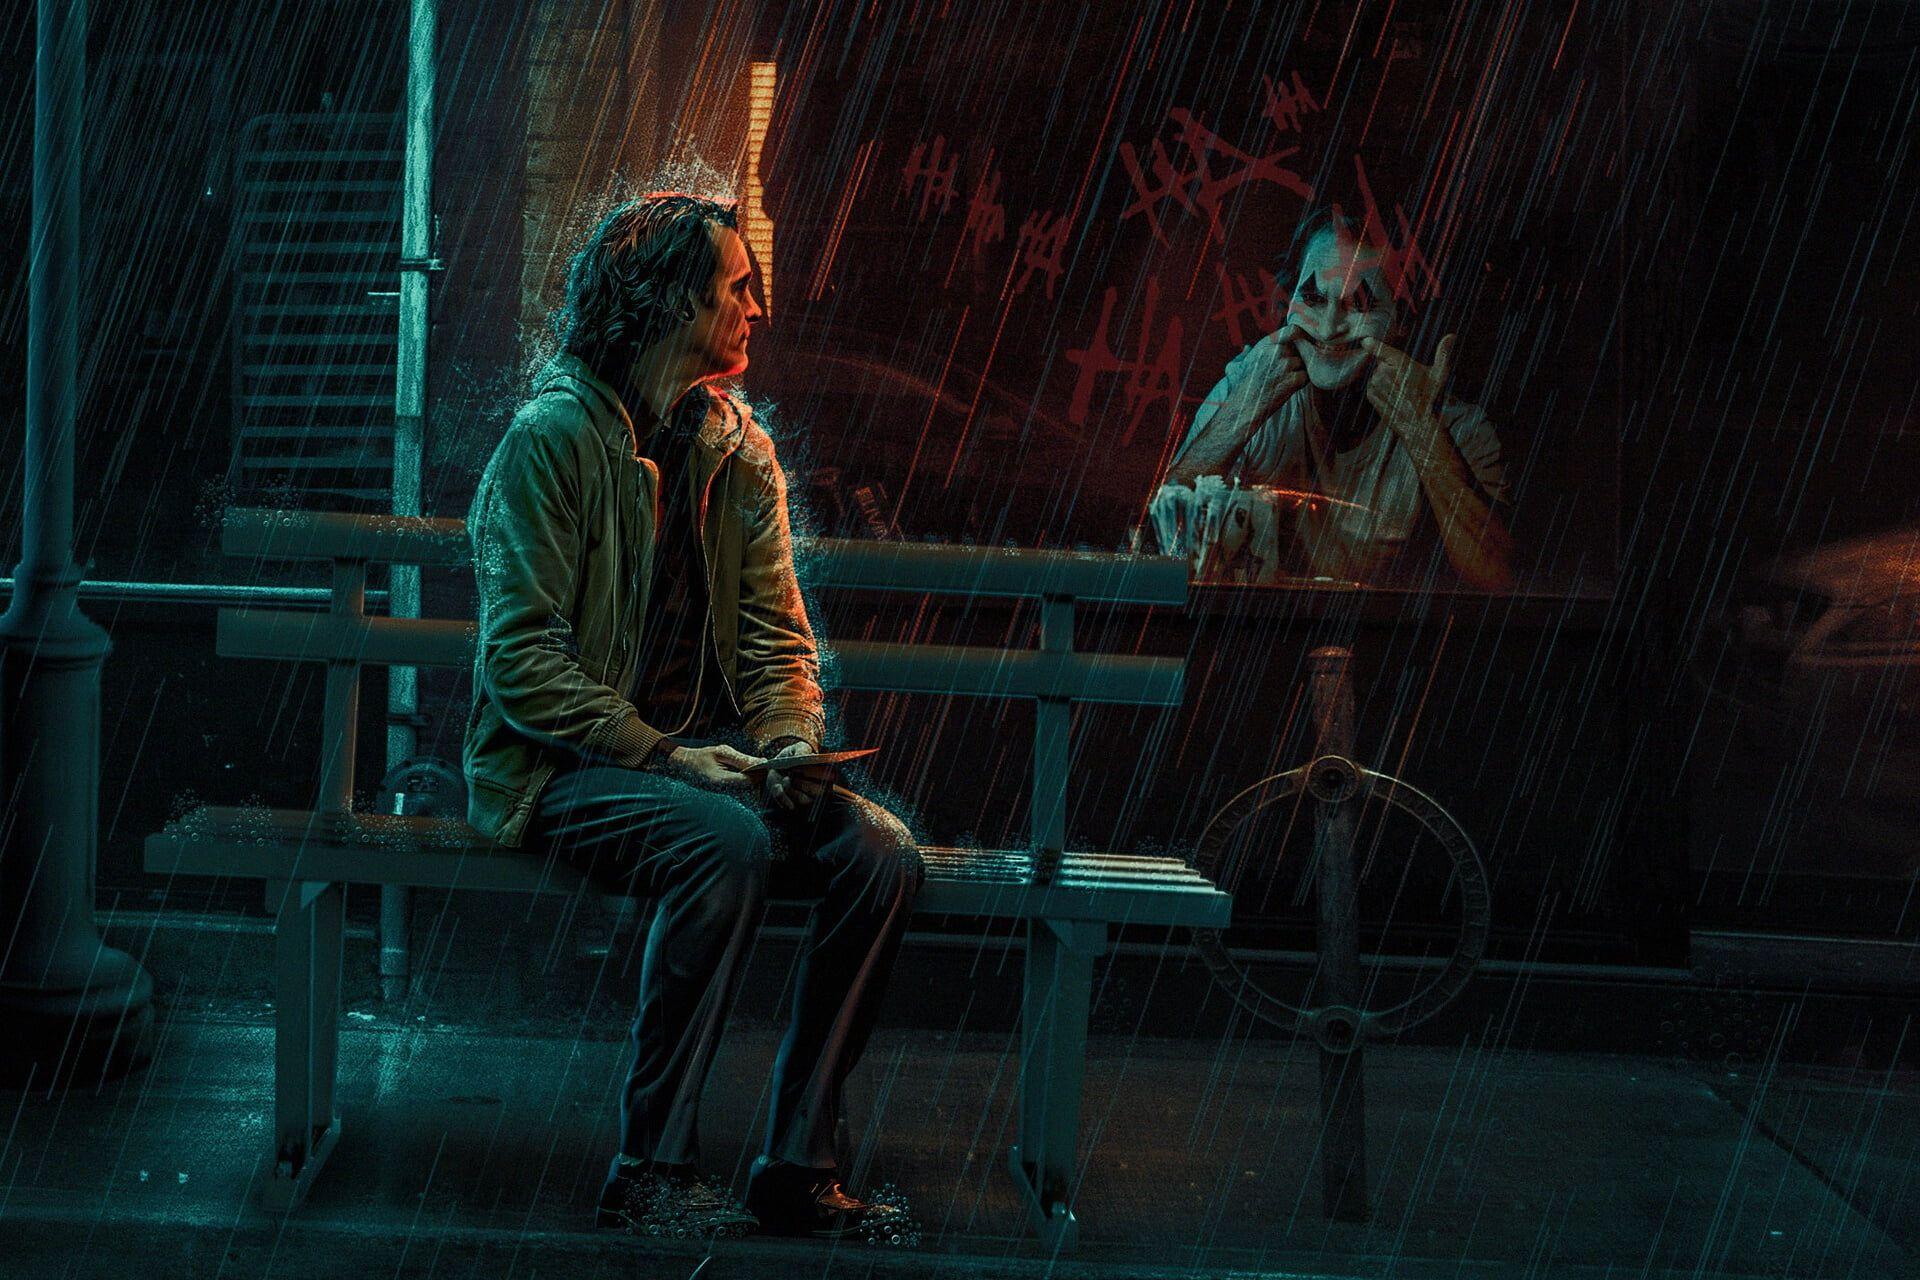 Joker Movies Artwork Joaquin Phoenix Joker 2019 Movie 1080p Wallpaper Hdwallpaper Desktop Joker Hd Wallpaper Joker Wallpapers Joker Images